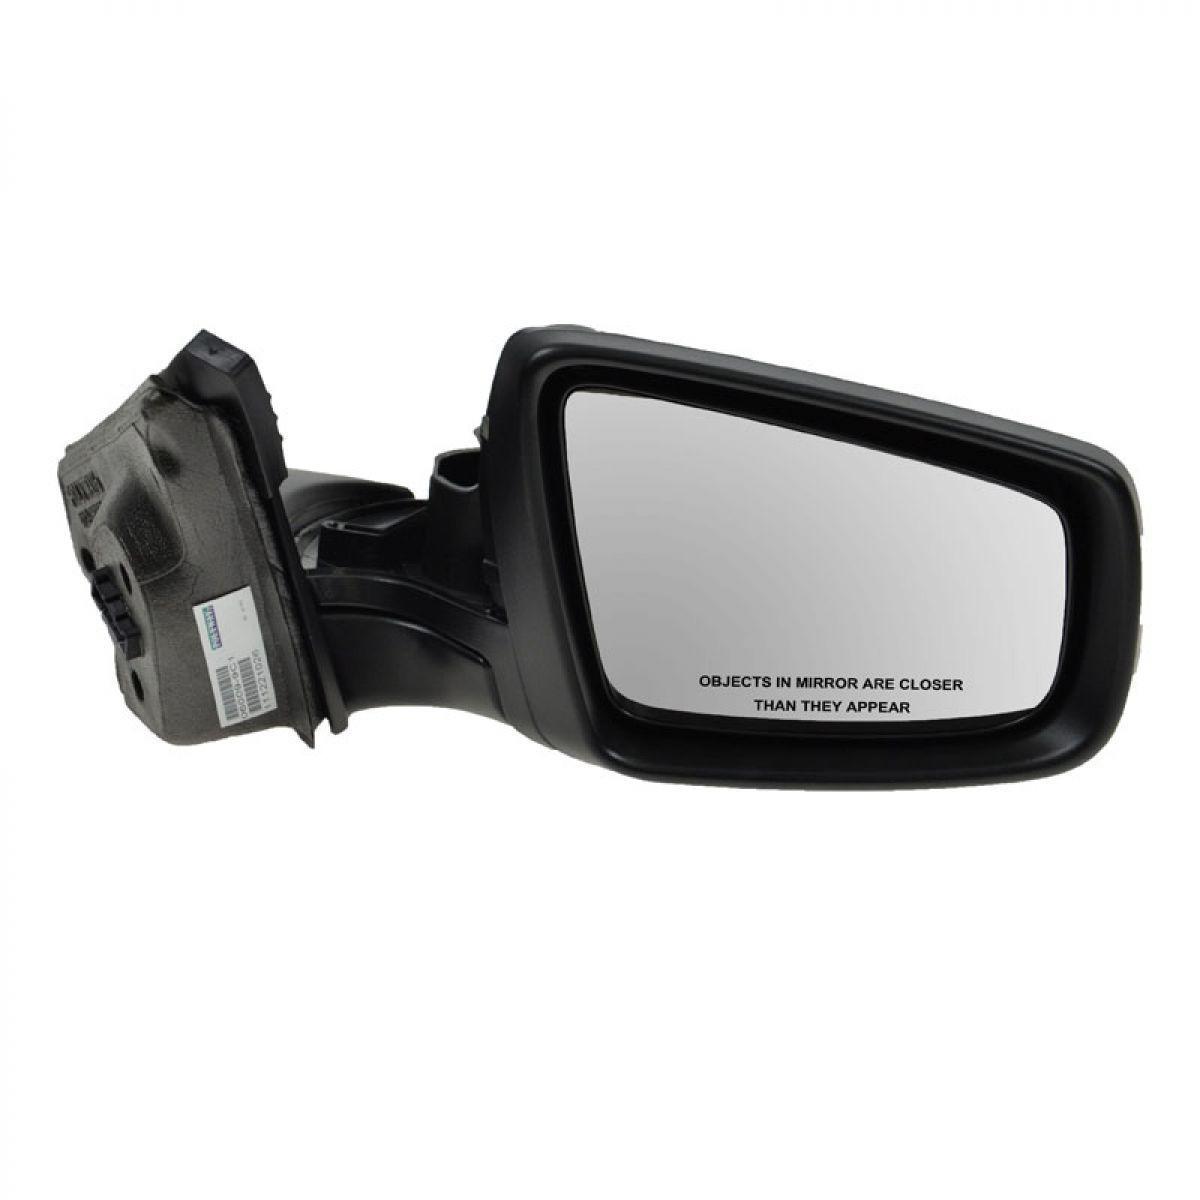 USミラー 新パワーパッセンジャーサイドミラービュイックの寿命保証付き New Power Passenger Side Mirror for a Buick With Lifetime Warranty